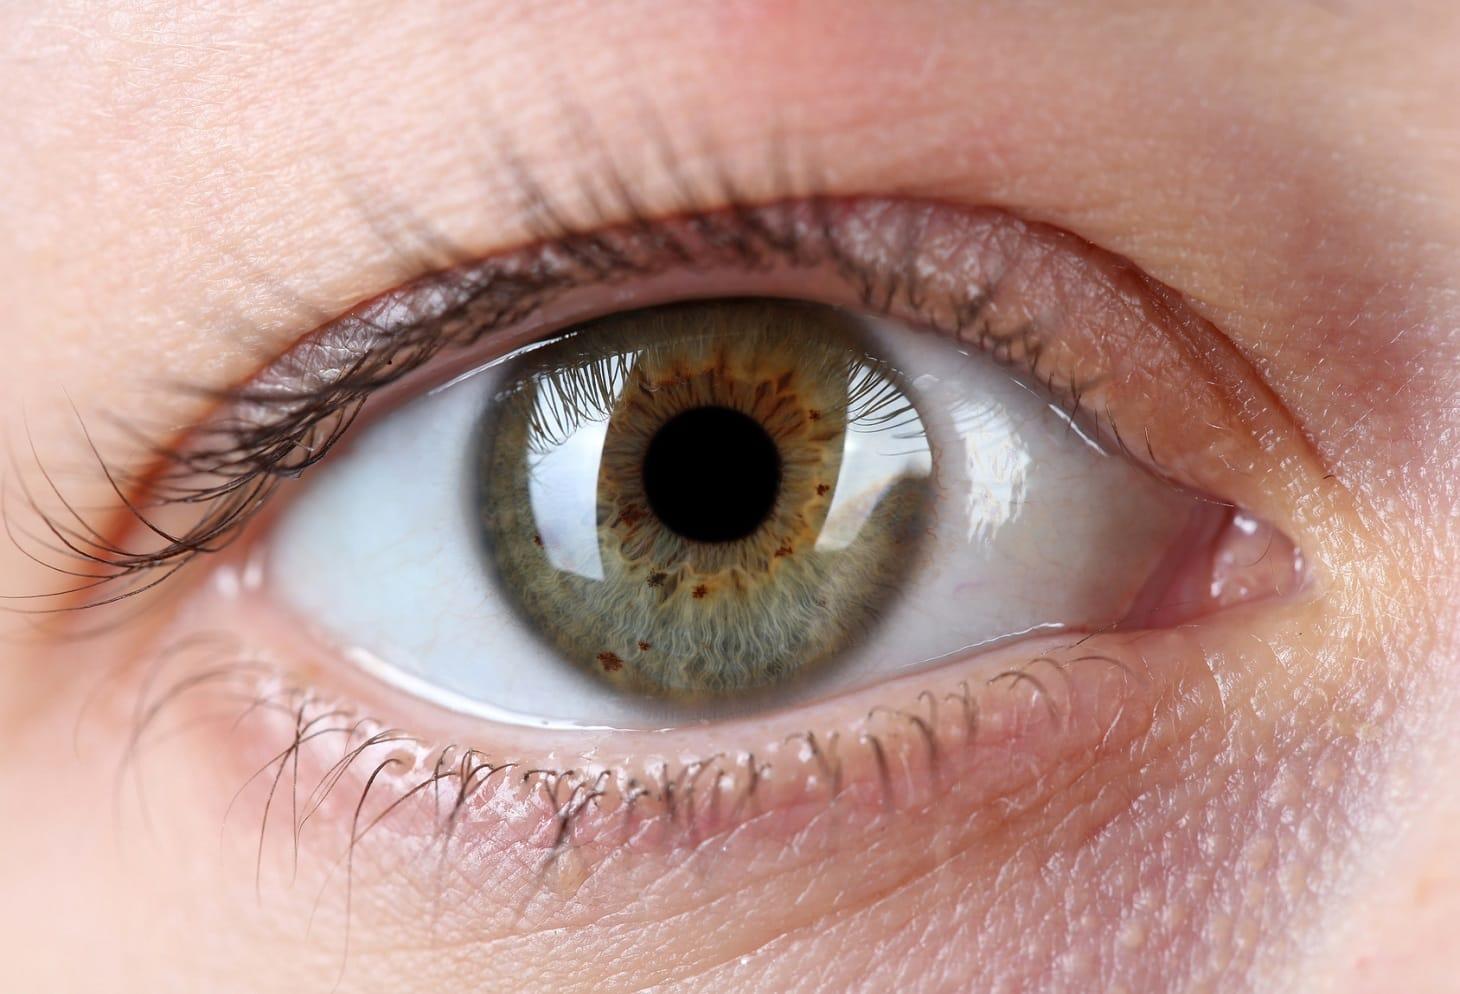 Occhi Irritati Ecco I Consigli Per Mantenerli Idratati